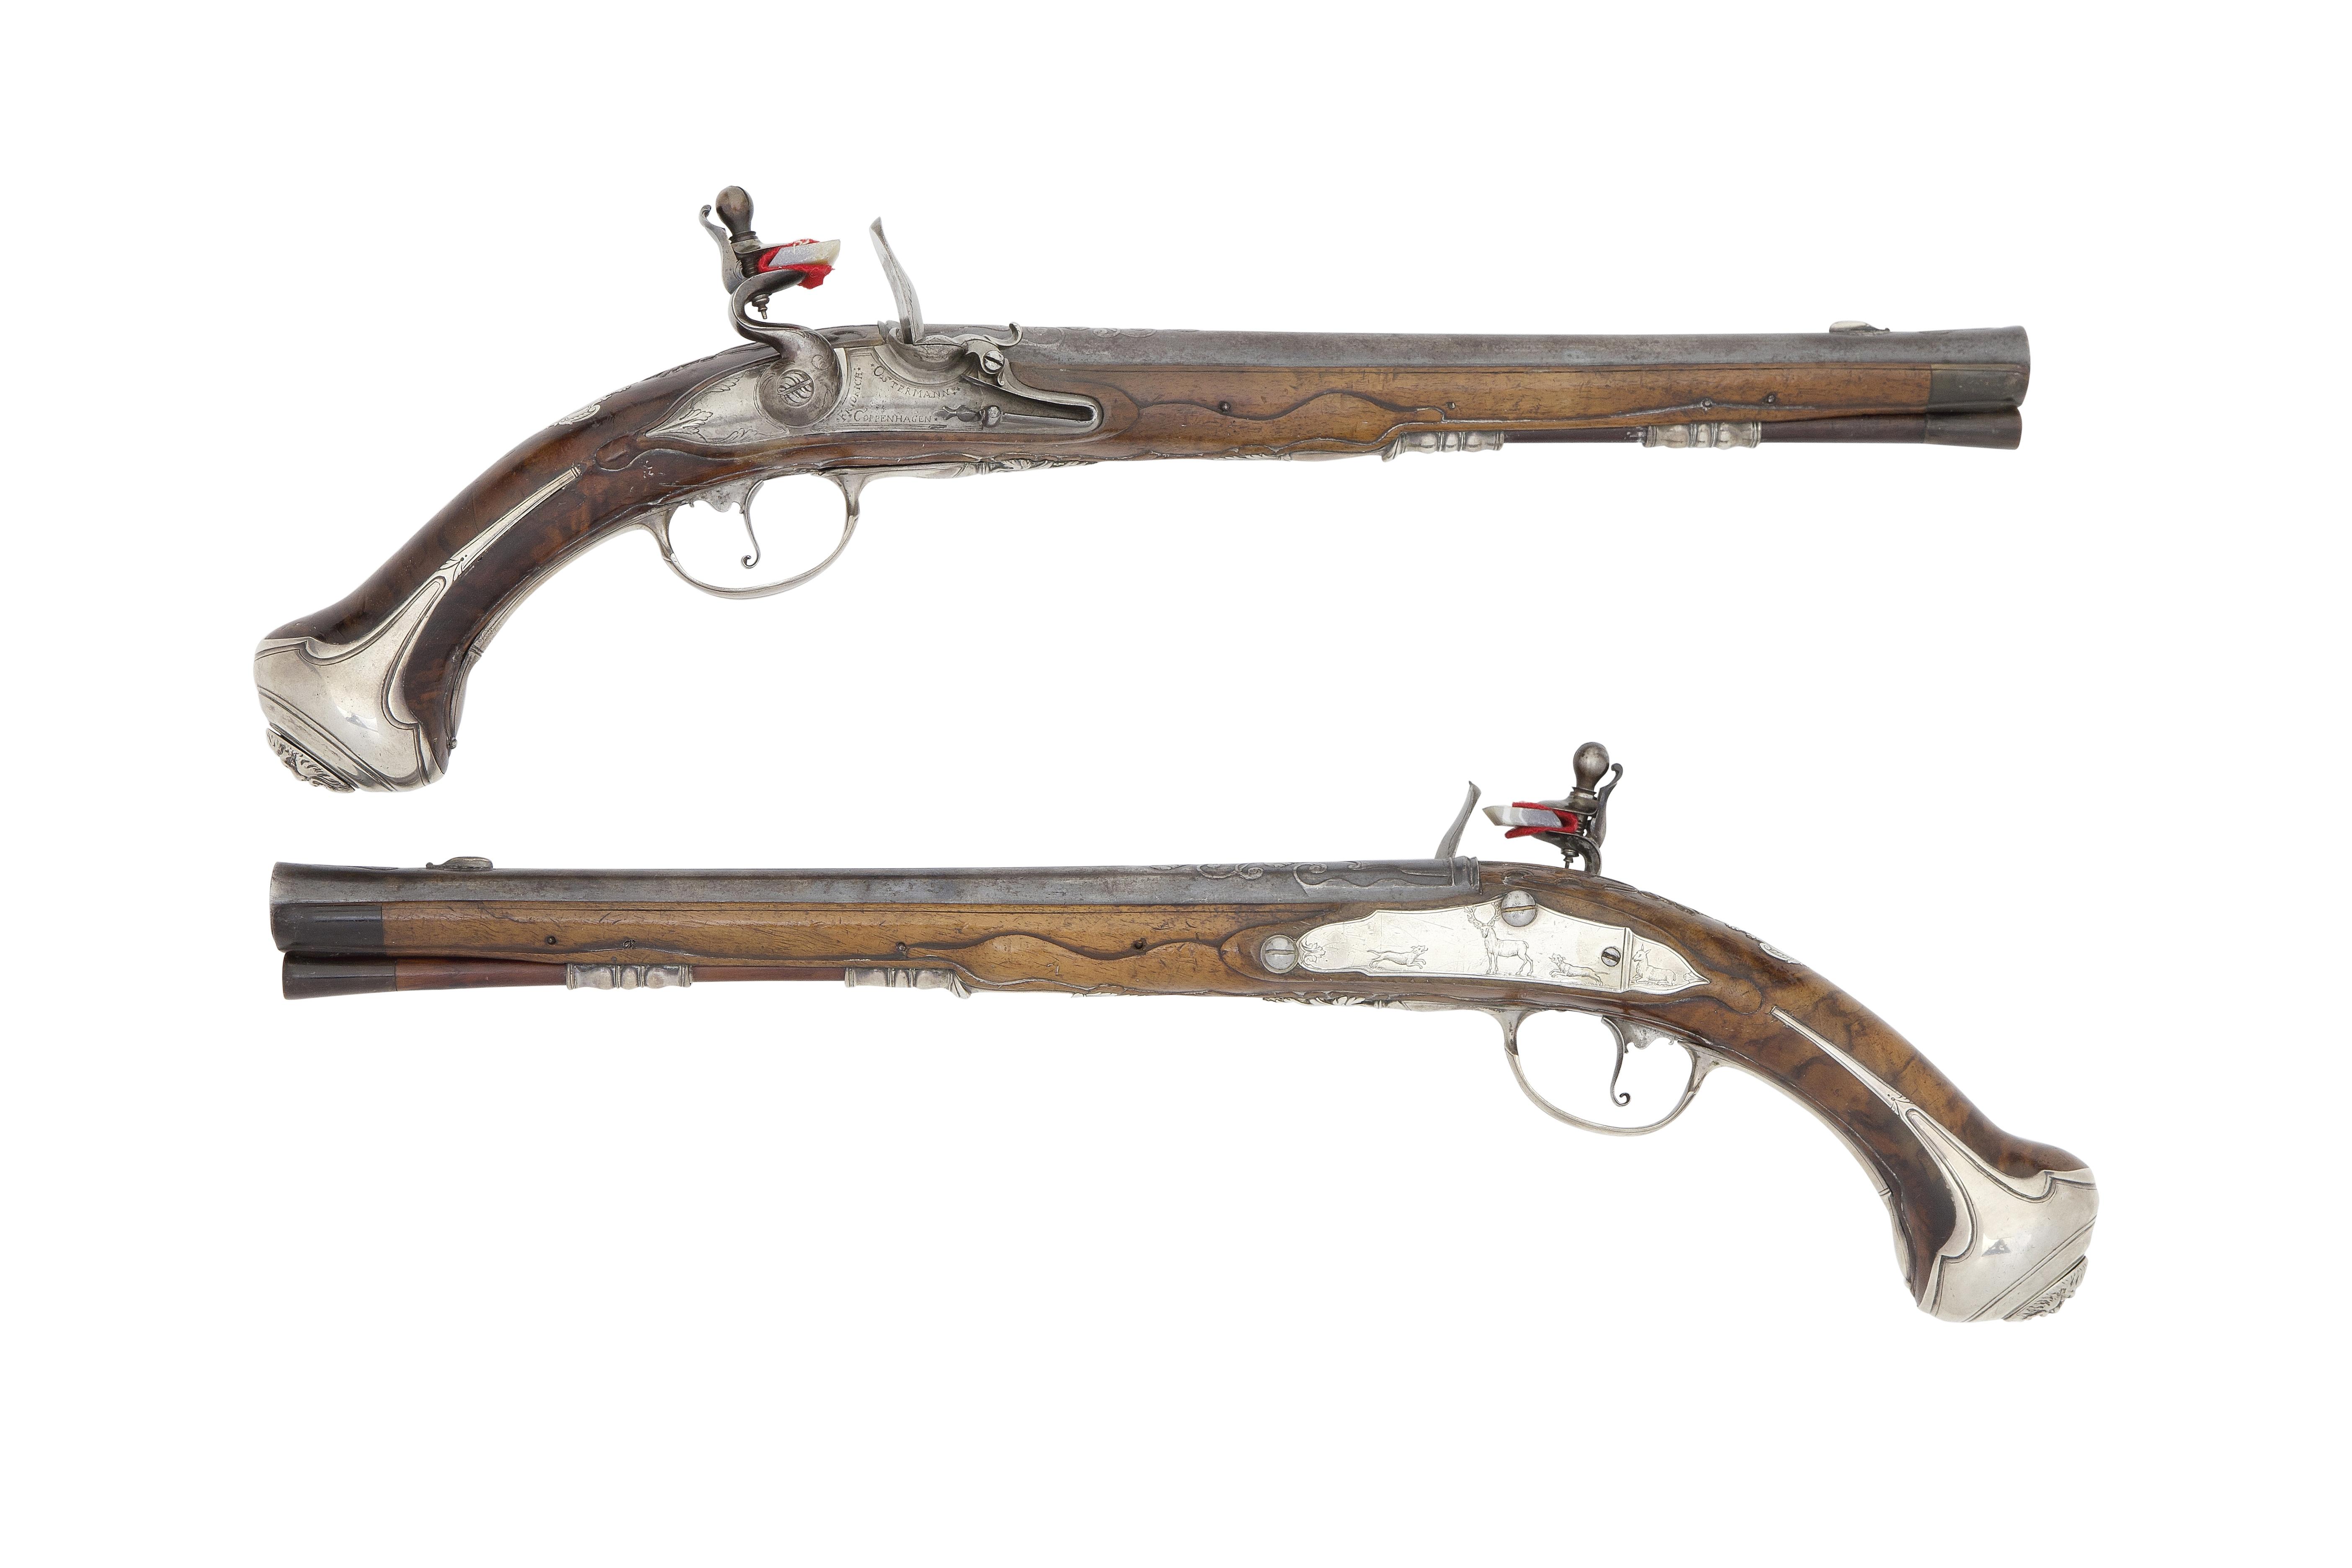 A Rare Pair Of Danish 22-Bore Flintlock Silver-Mounted Holster Pistols From Jagdschloß Krani...